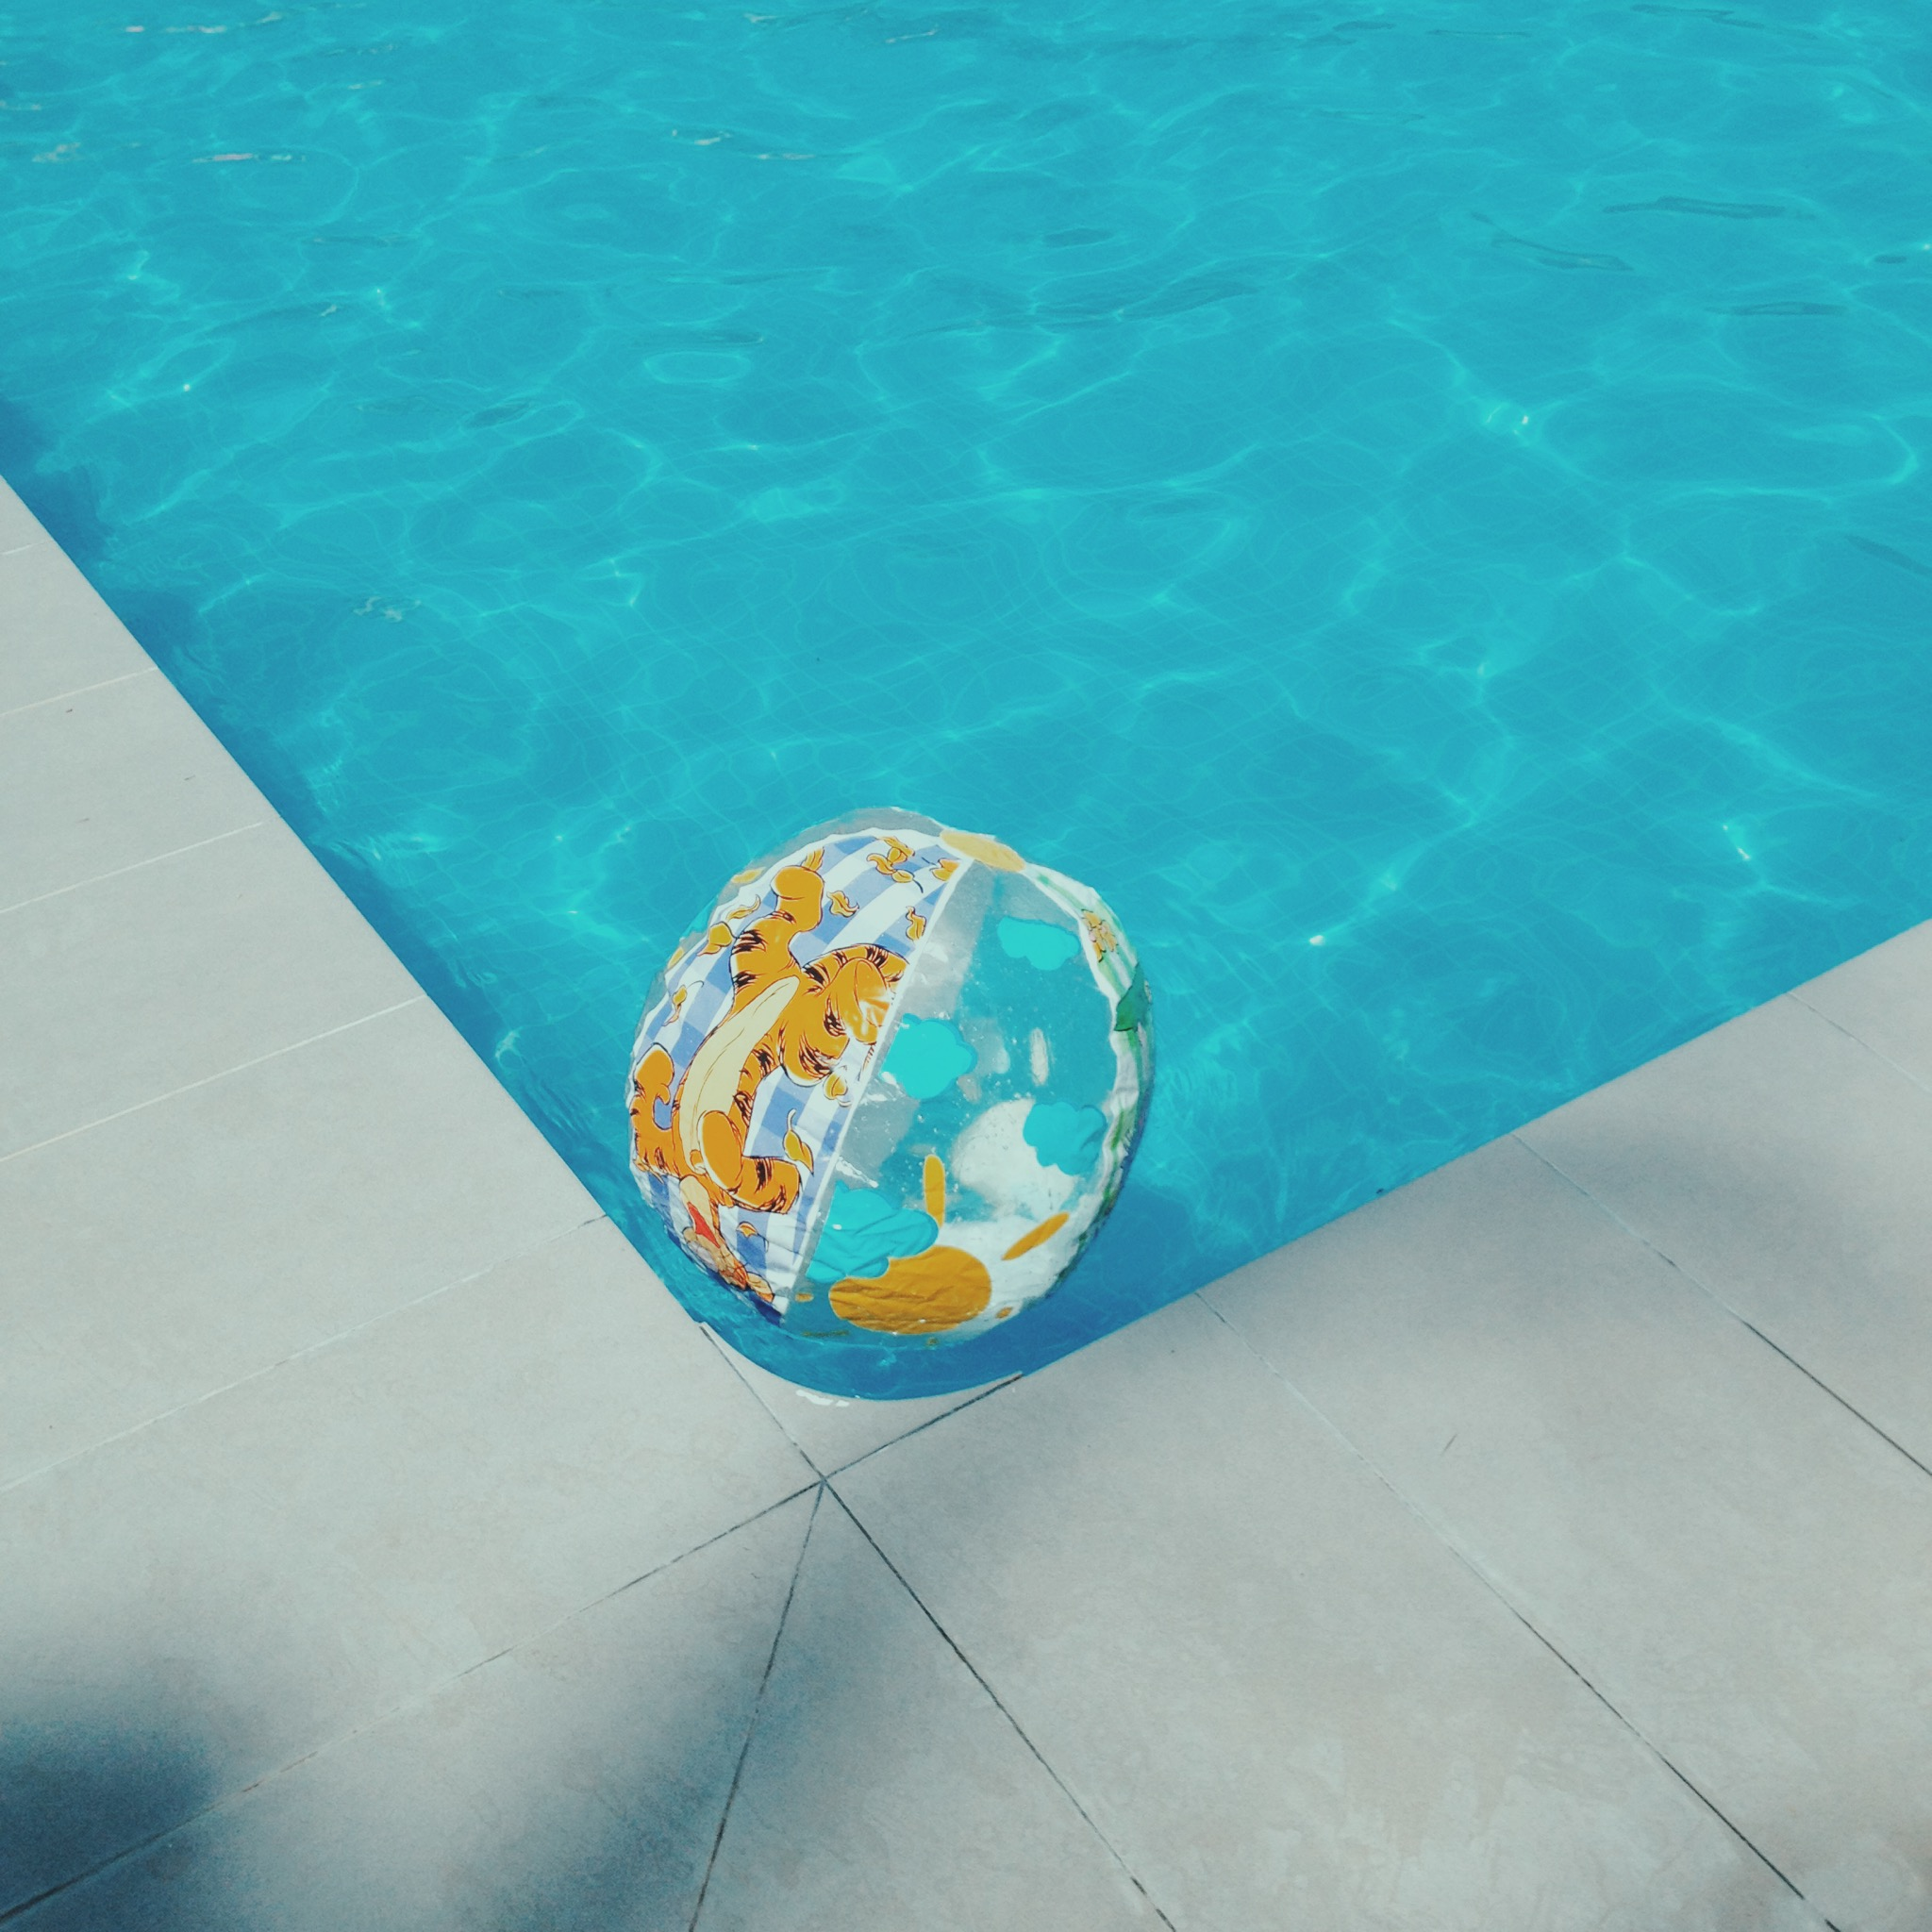 VSCO - Kiddie pool | jnpl